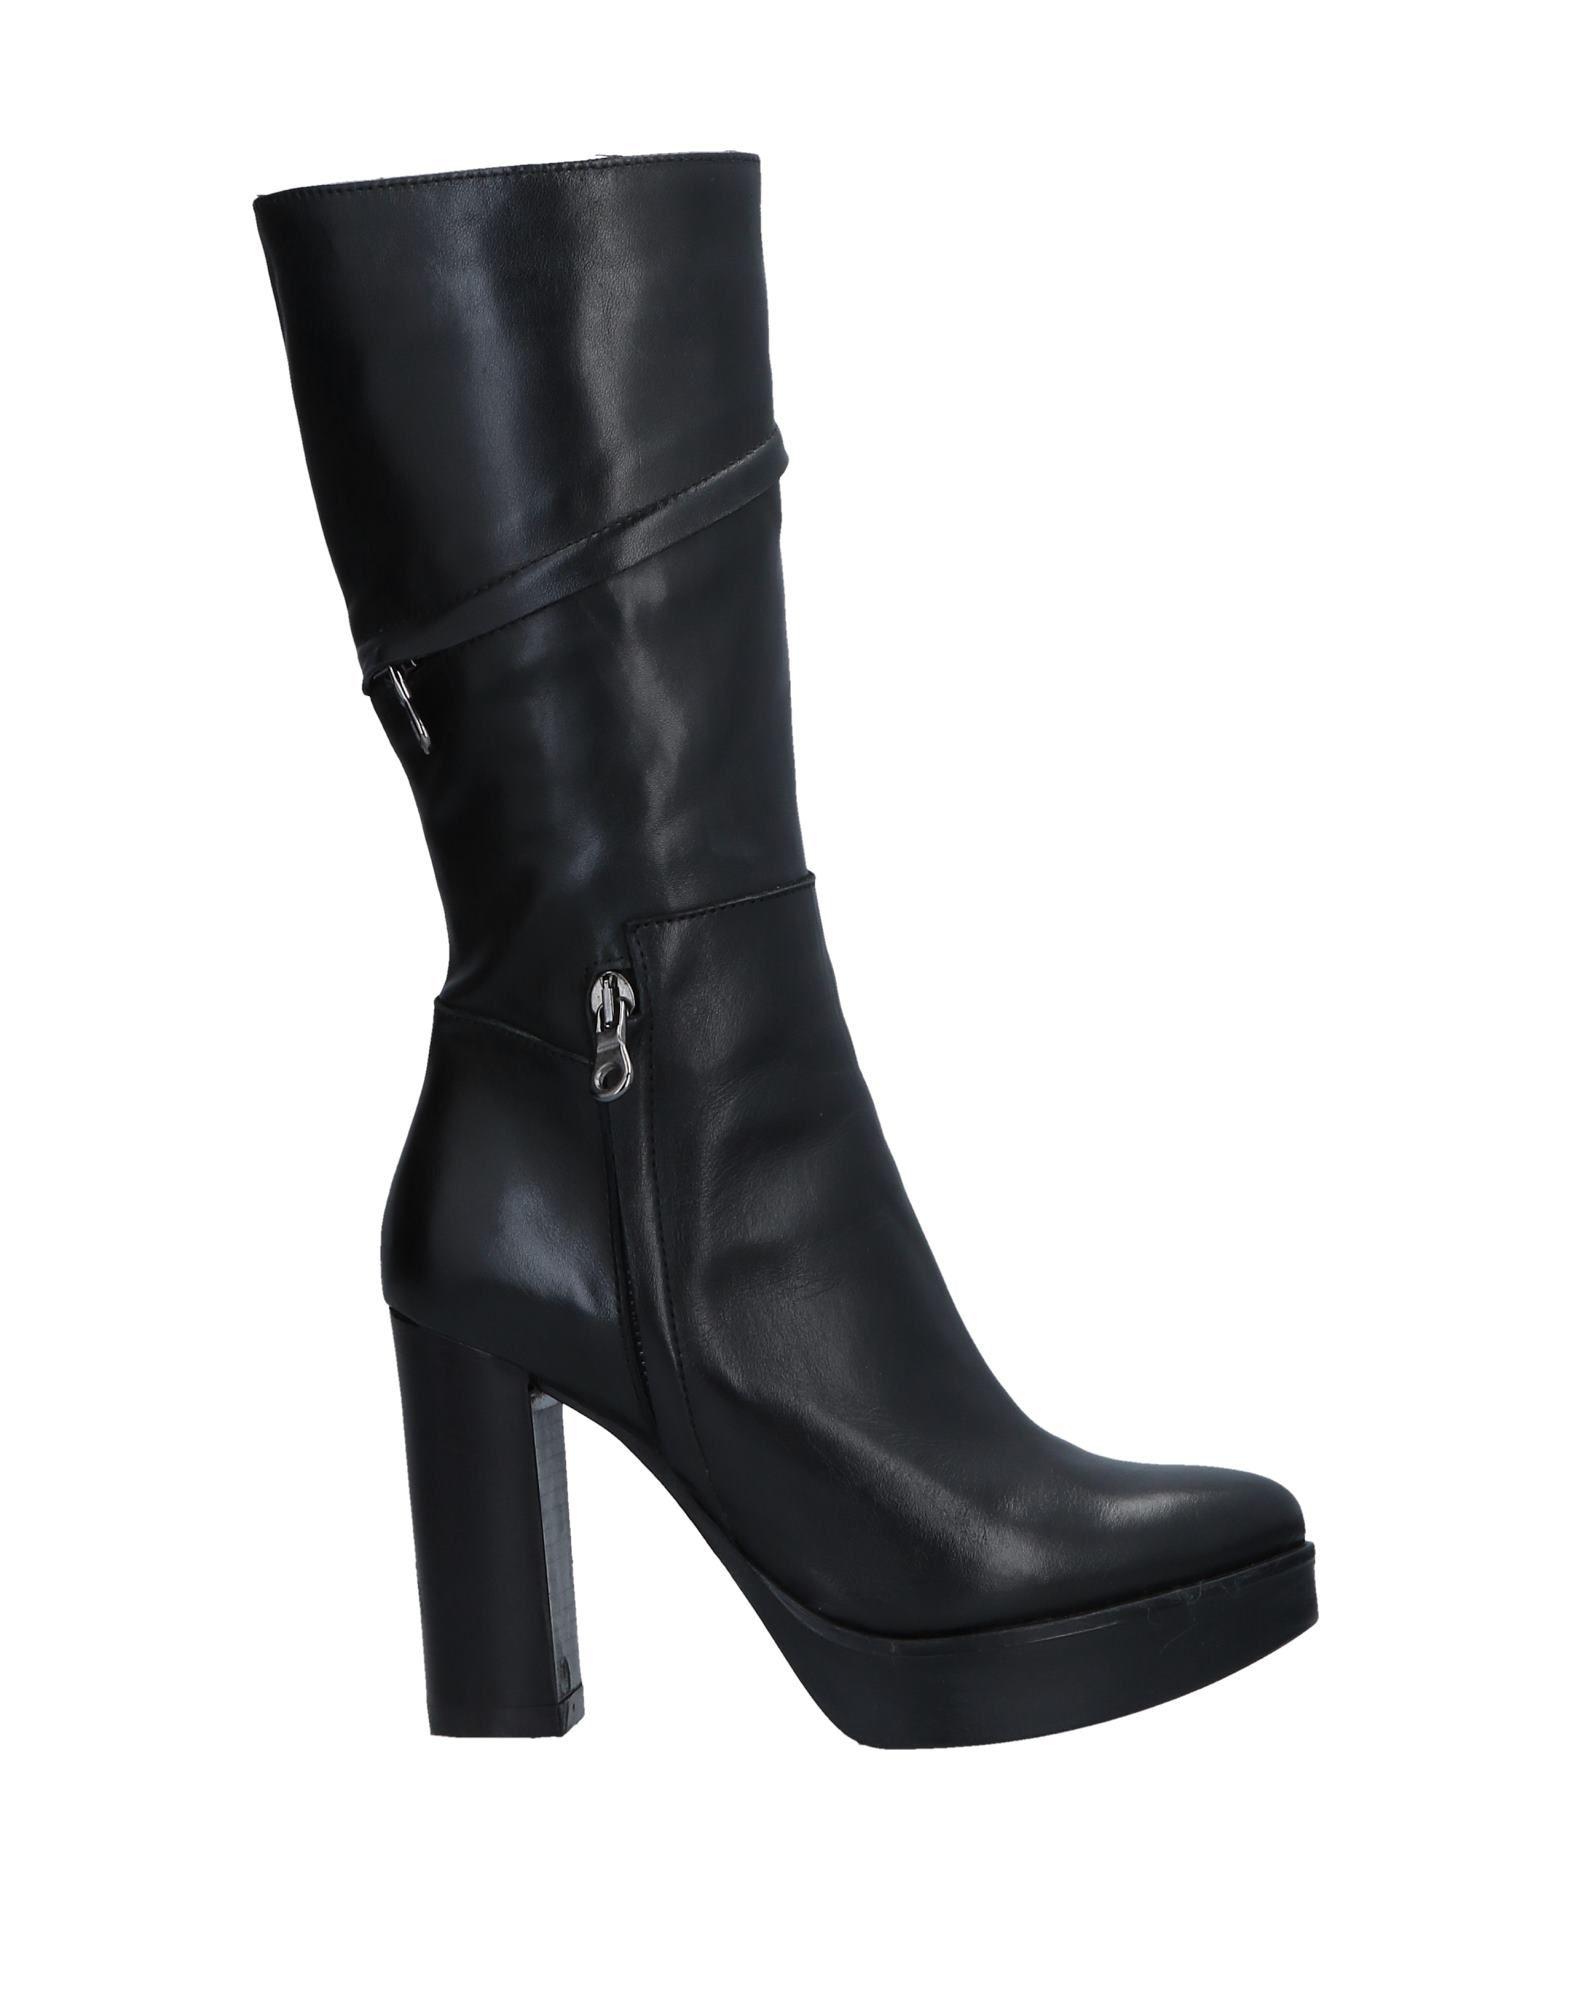 Jada Simon Stiefel Damen  11538049FJ Gute Qualität beliebte Schuhe